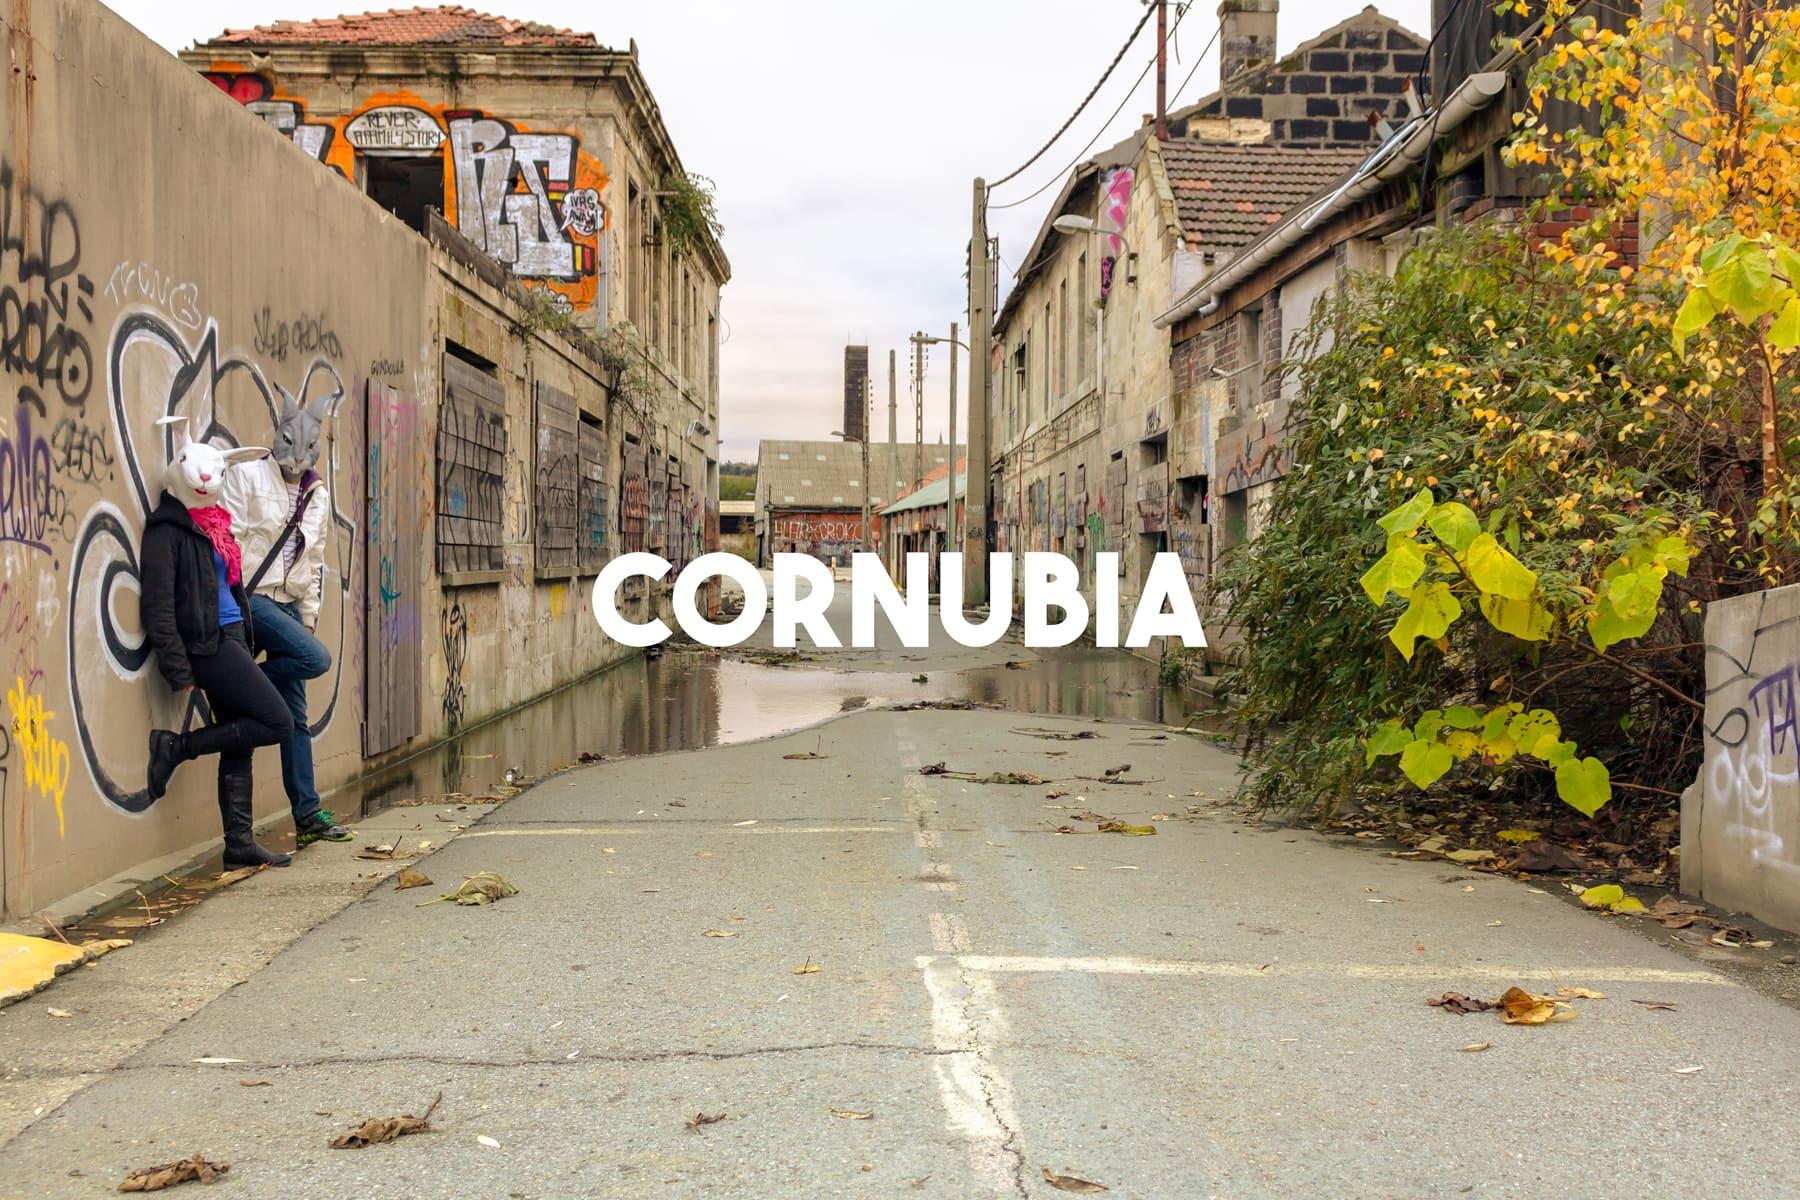 Usine Cornubia située à Bordeaux   urbexsession.com/cornubia   Urbex Bordeaux